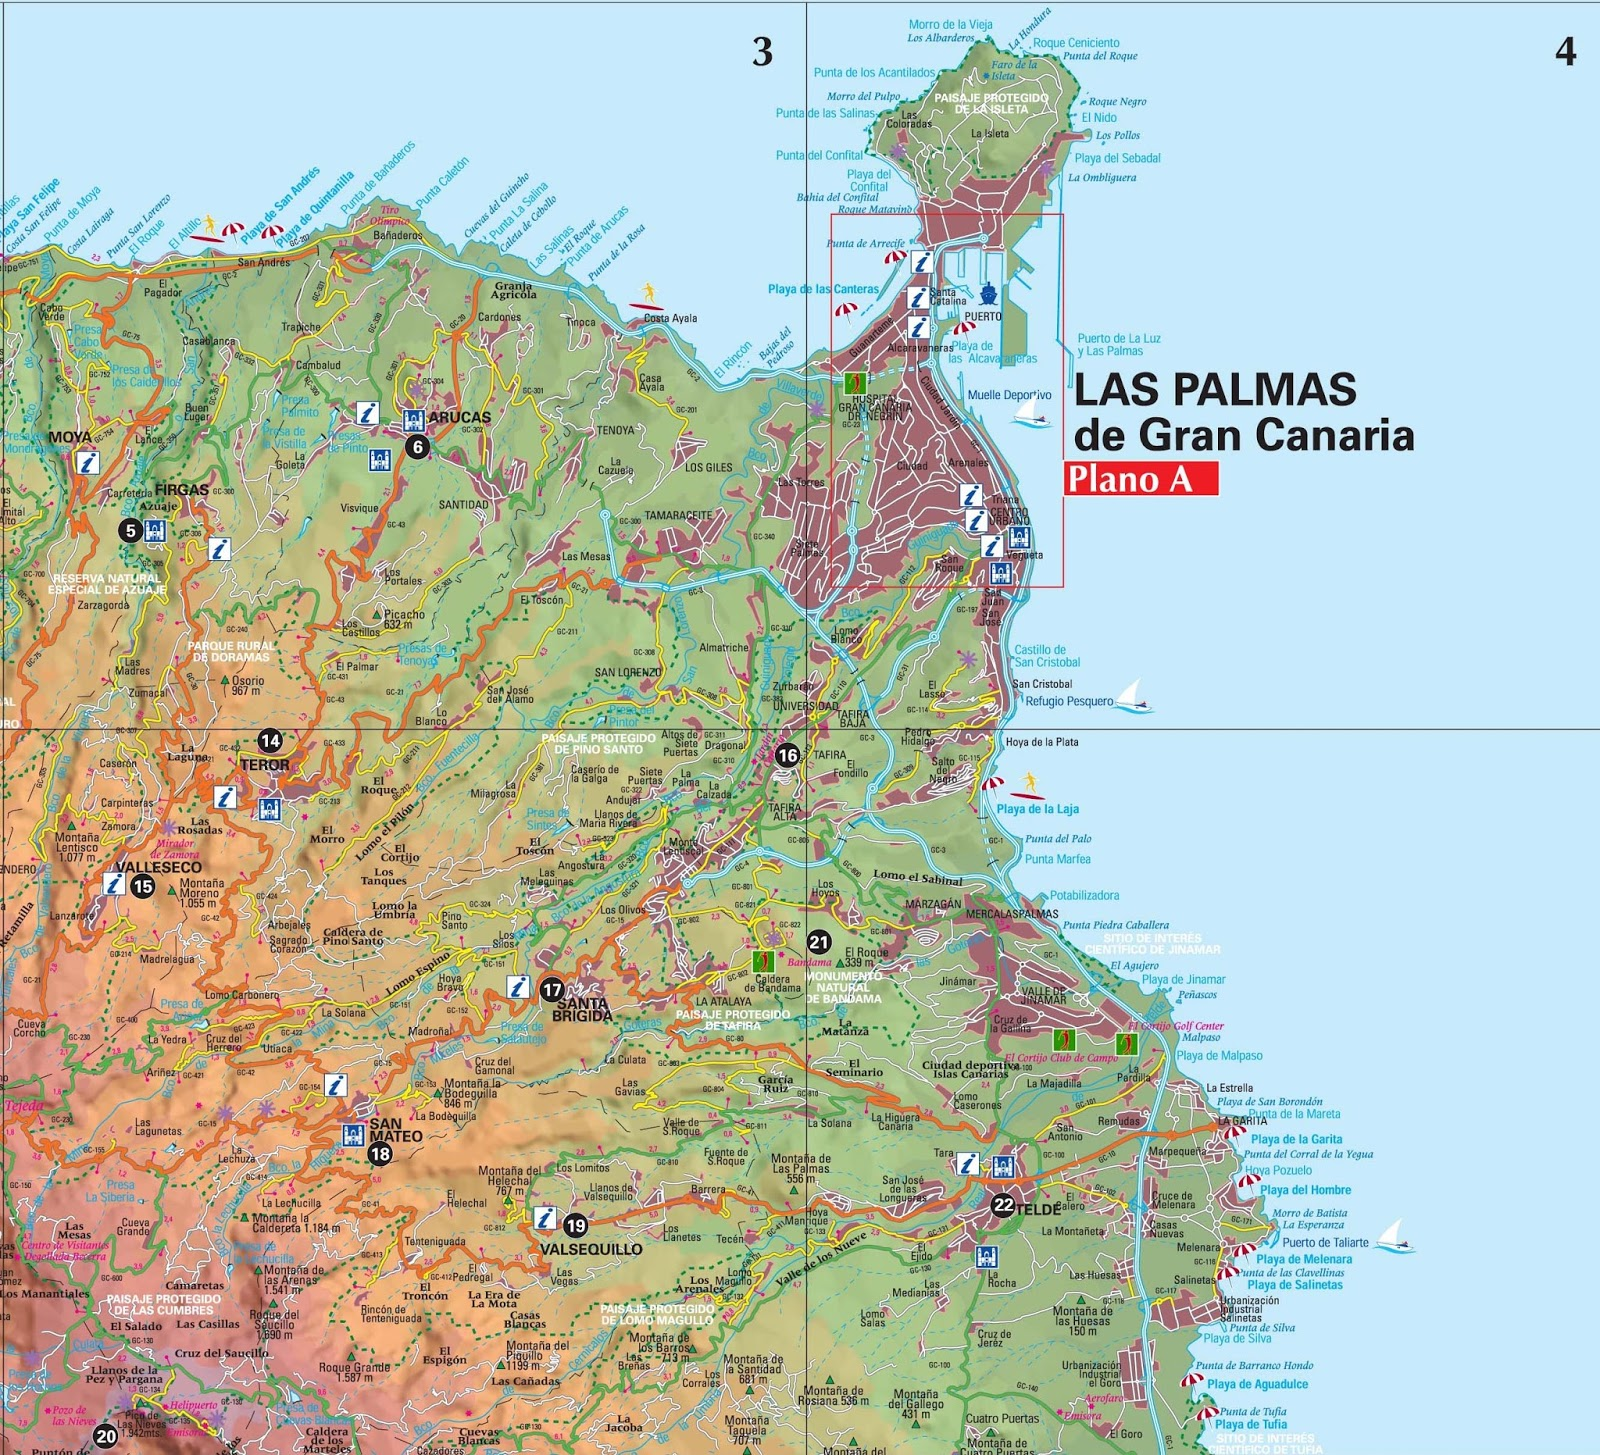 Mapas de las palmas de gran canaria espanha mapasblog - Pisos com las palmas de gran canaria ...